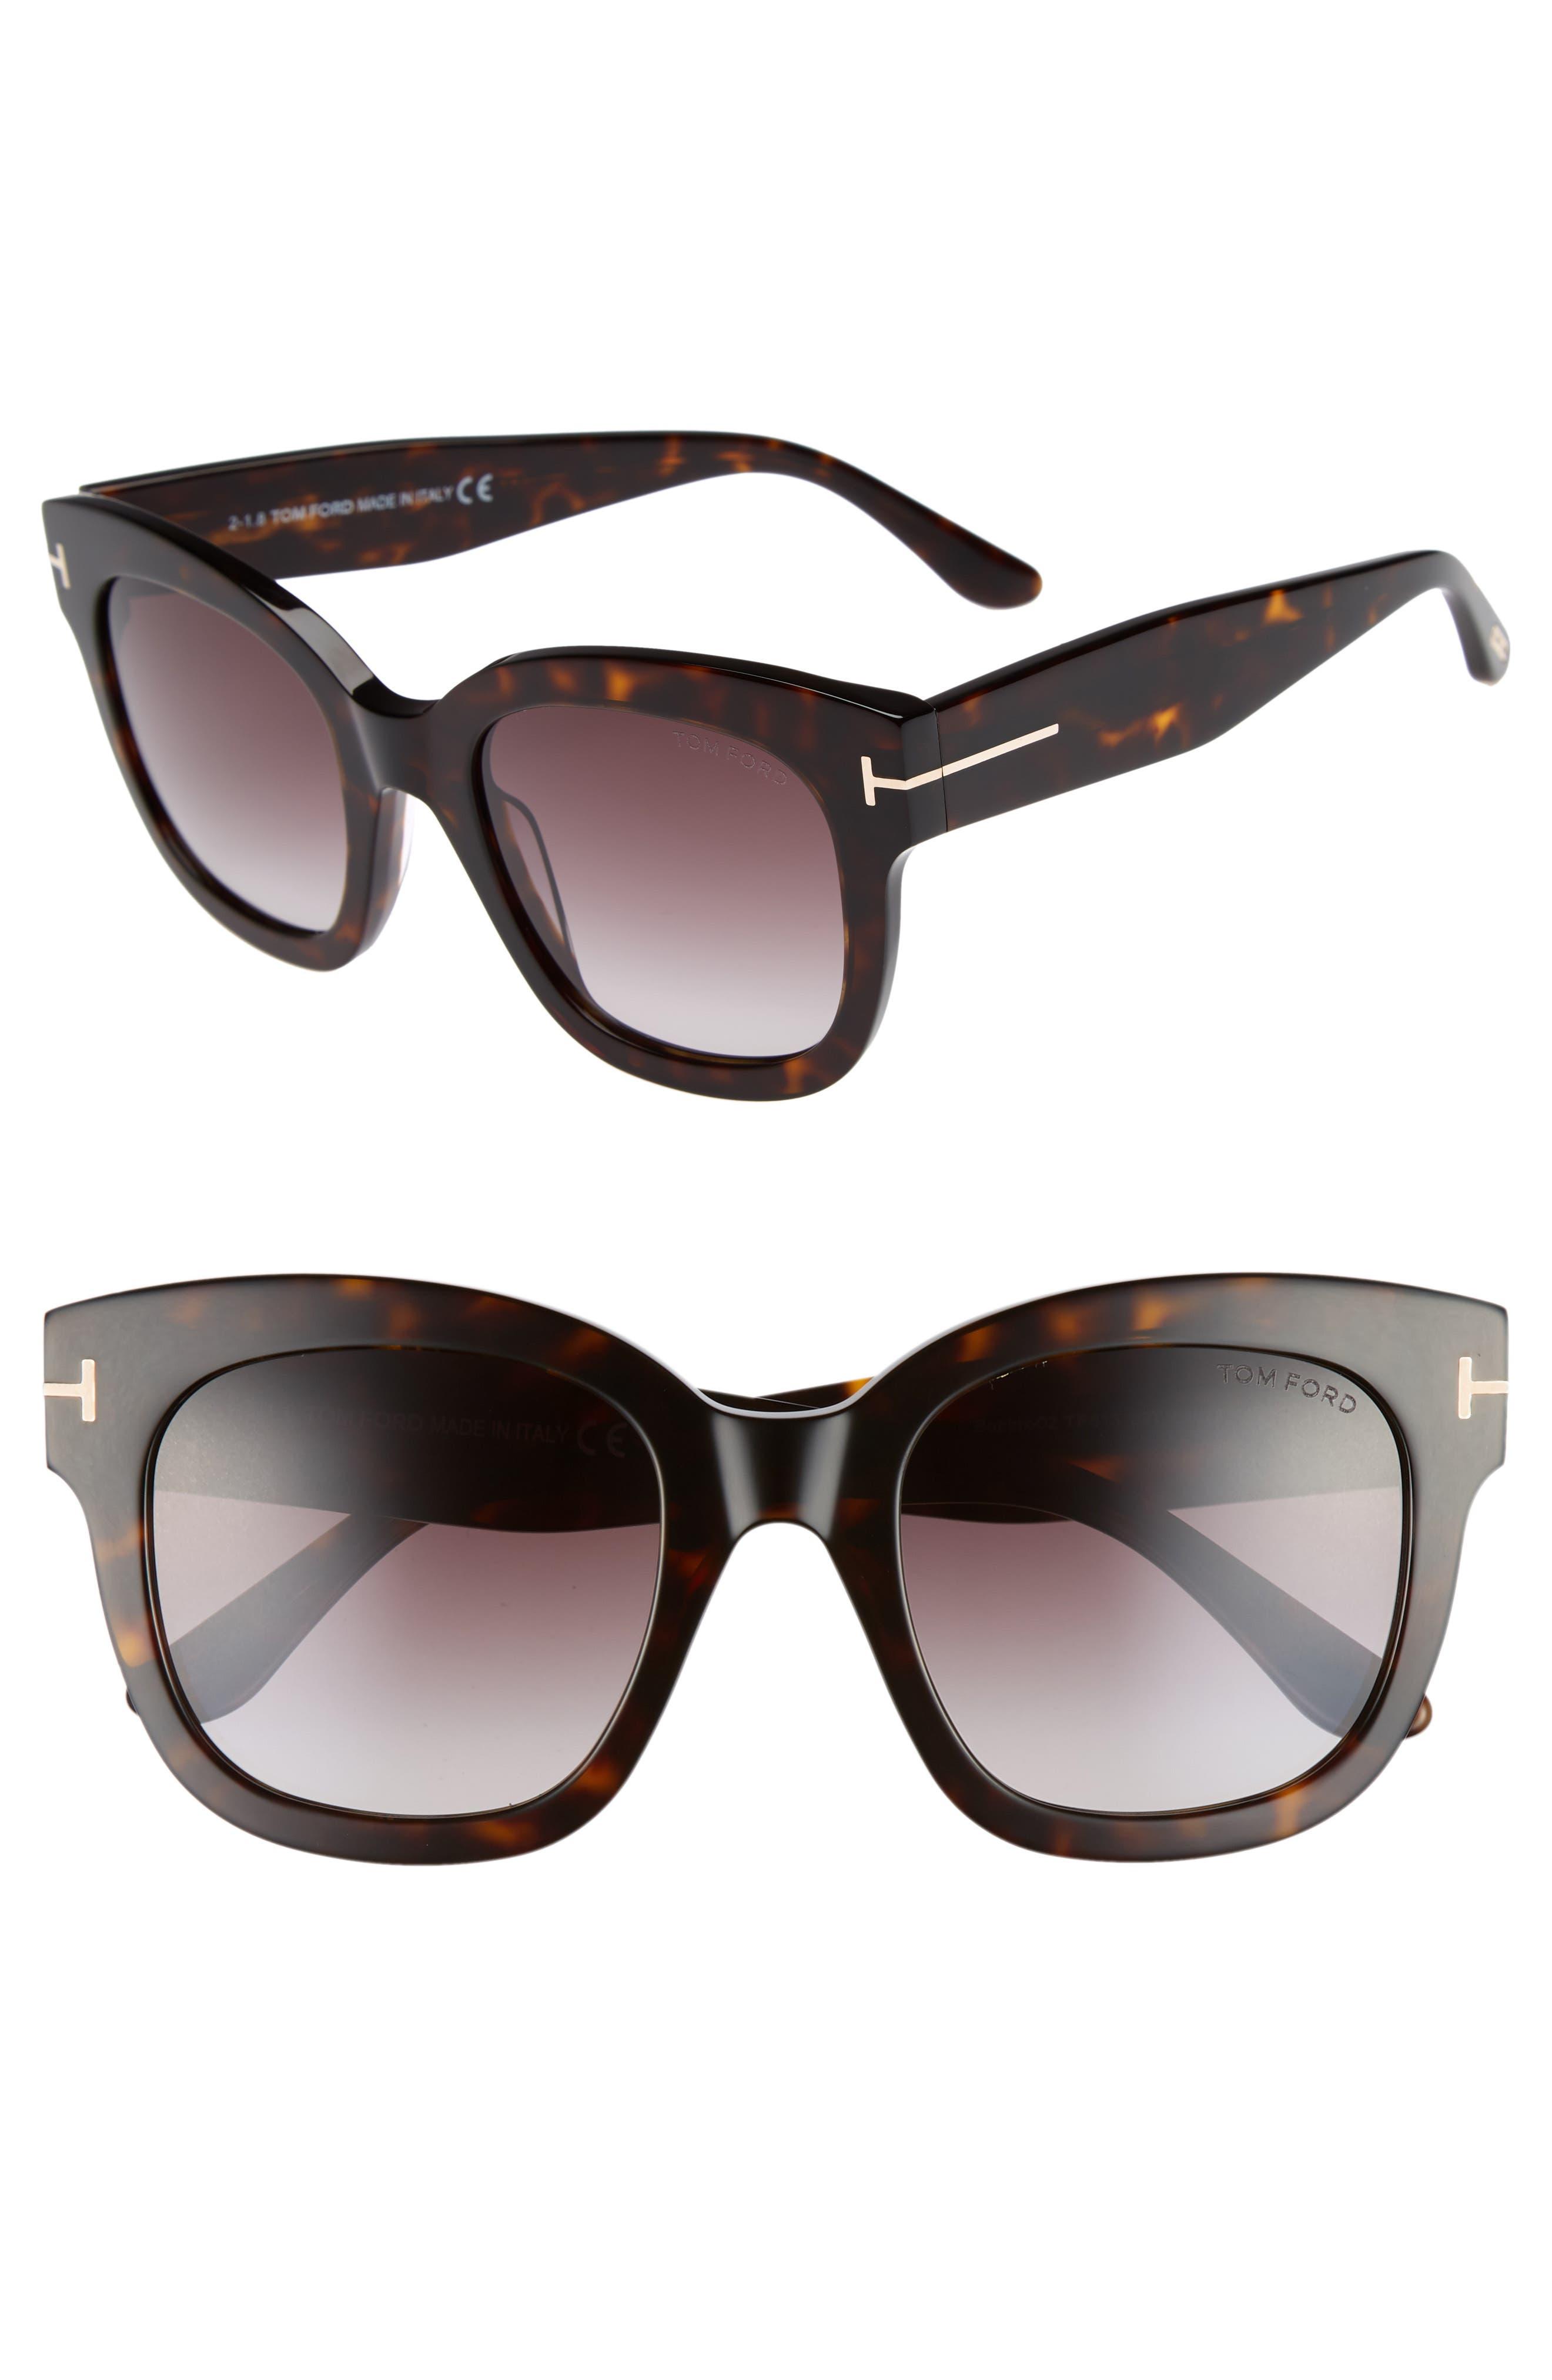 Beatrix 52mm Sunglasses,                         Main,                         color, Dark Havana/ Gradient Bordeaux